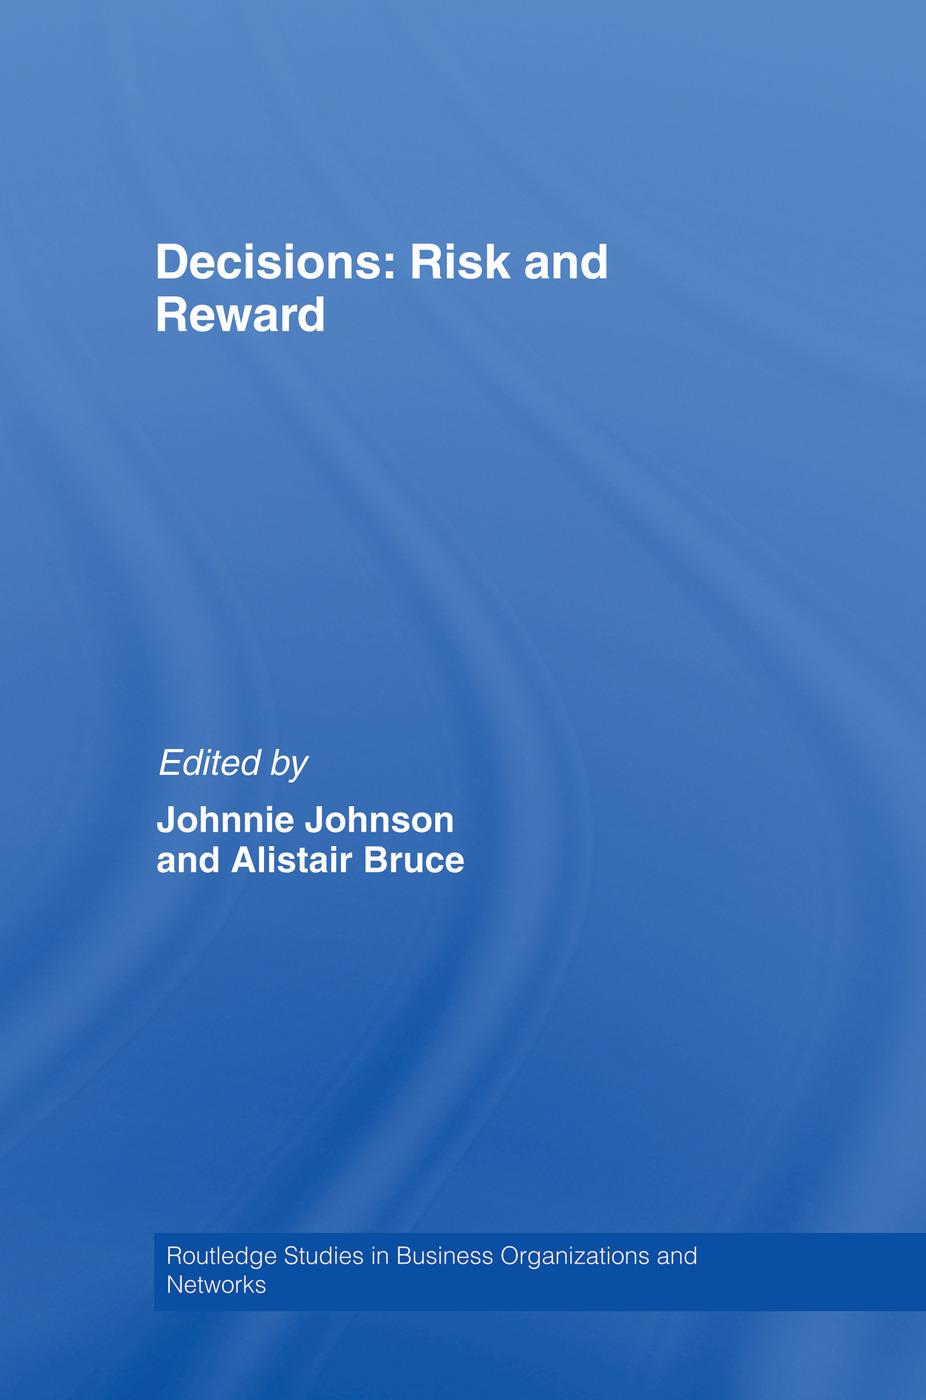 Decisions: Risk and Reward